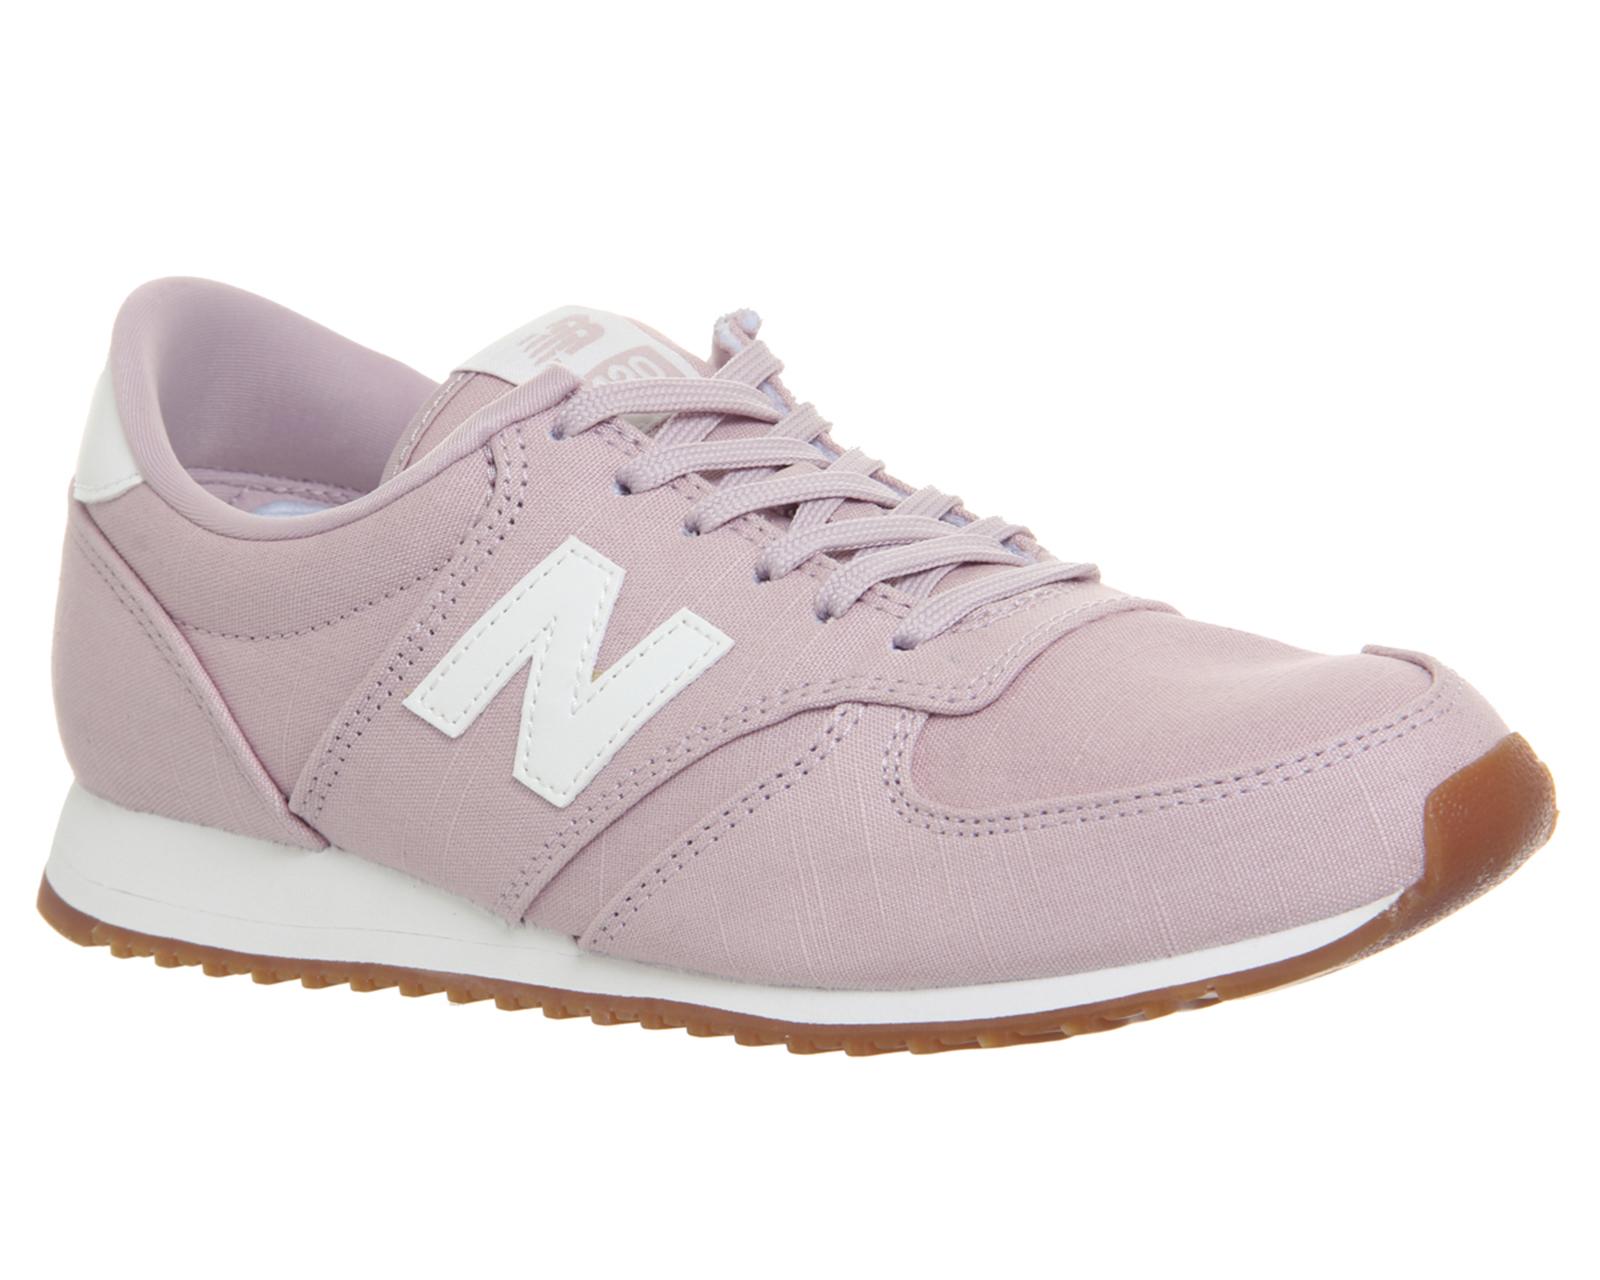 new balance 420 gris y rosa